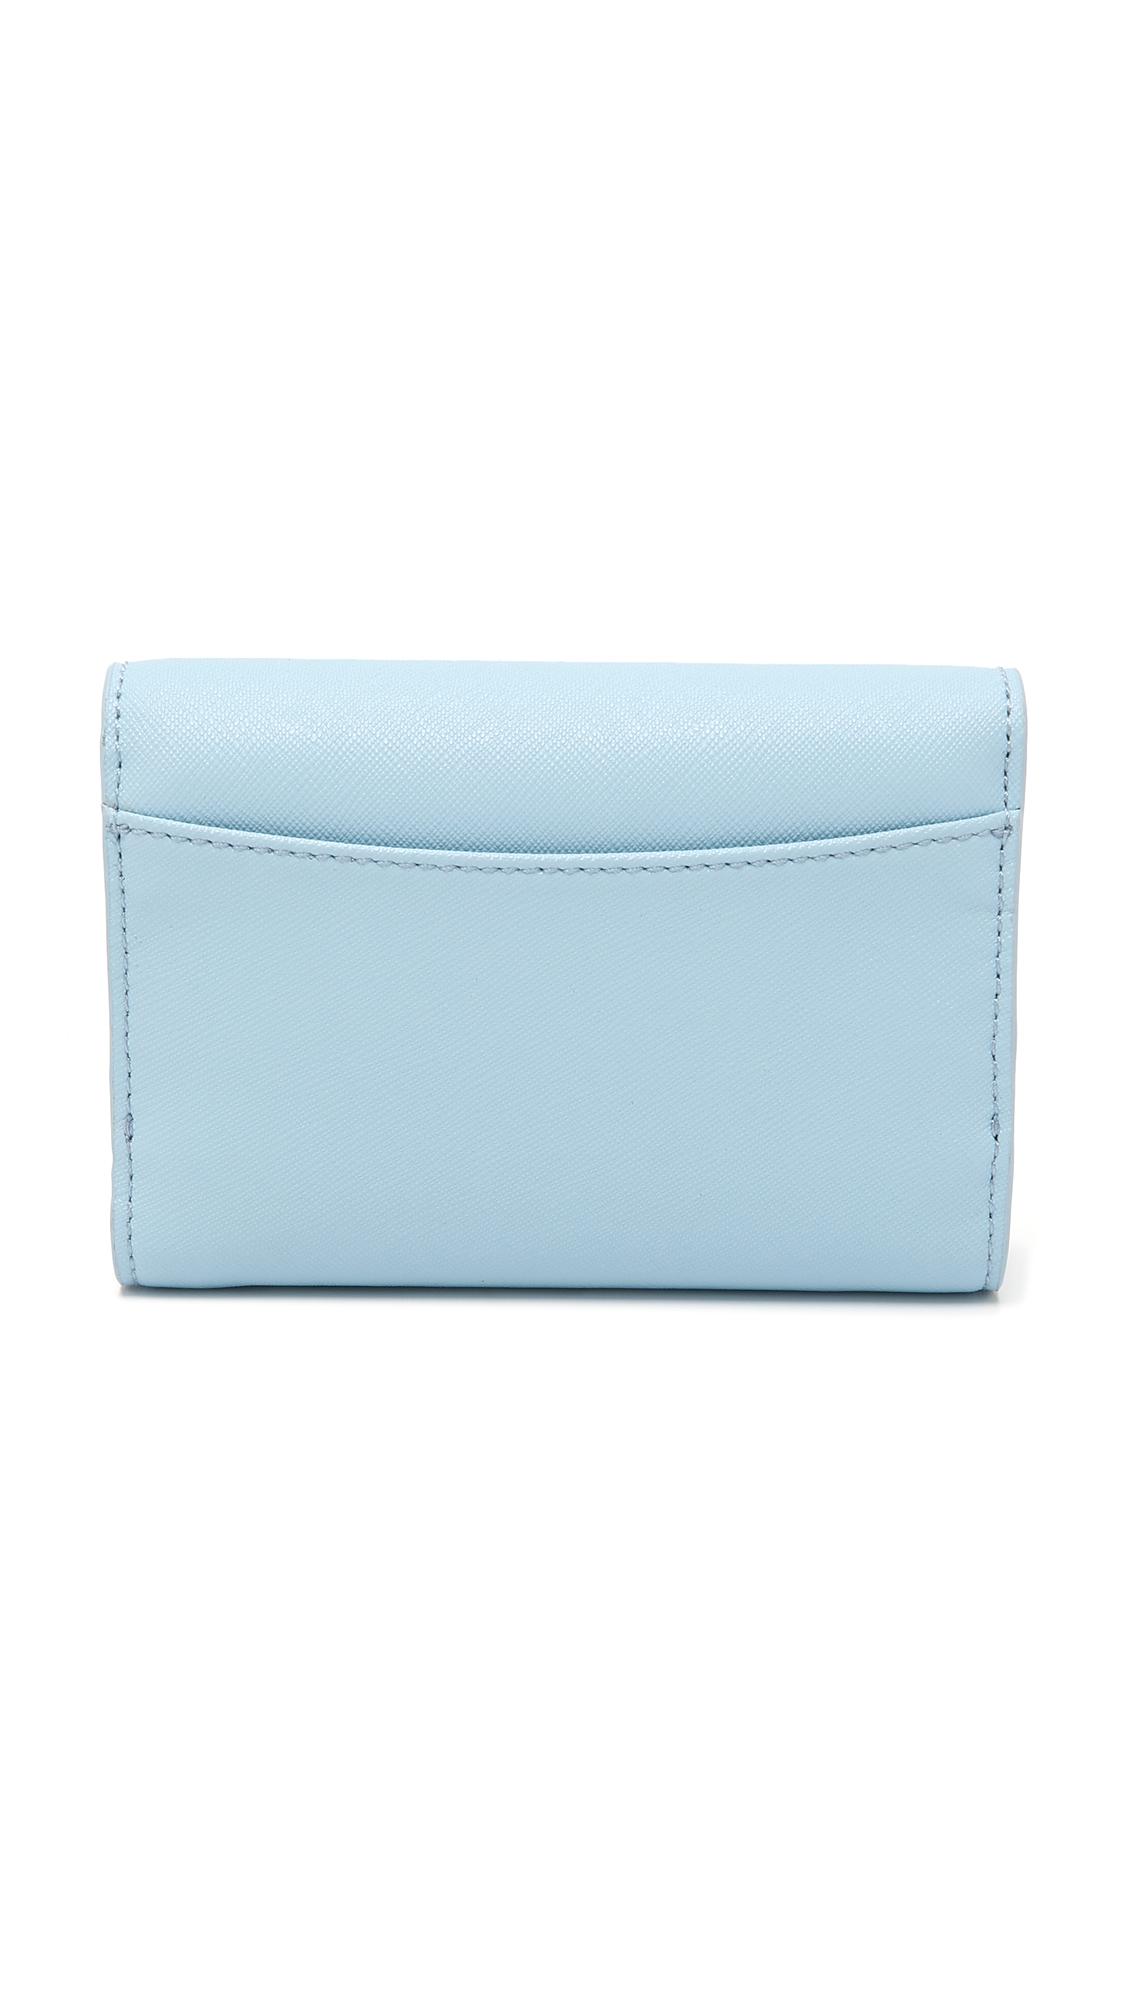 Lyst Tory Burch Robinson Medium Flap Wallet Iceberg in Blue